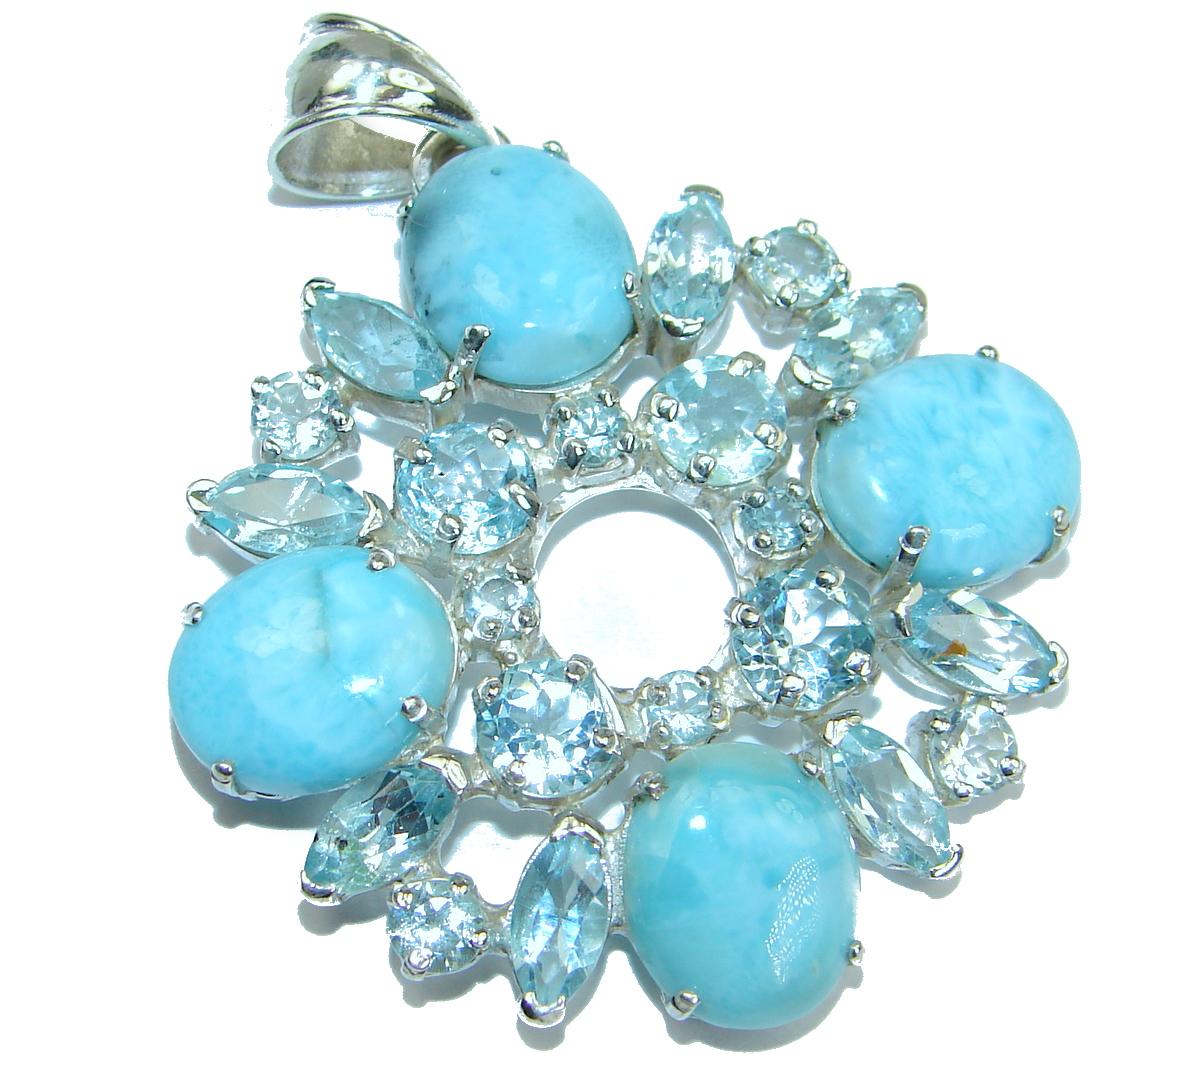 Sky Delight genuine Larimar Swiss Blue Topaz .925 Sterling Silver handmade pendant